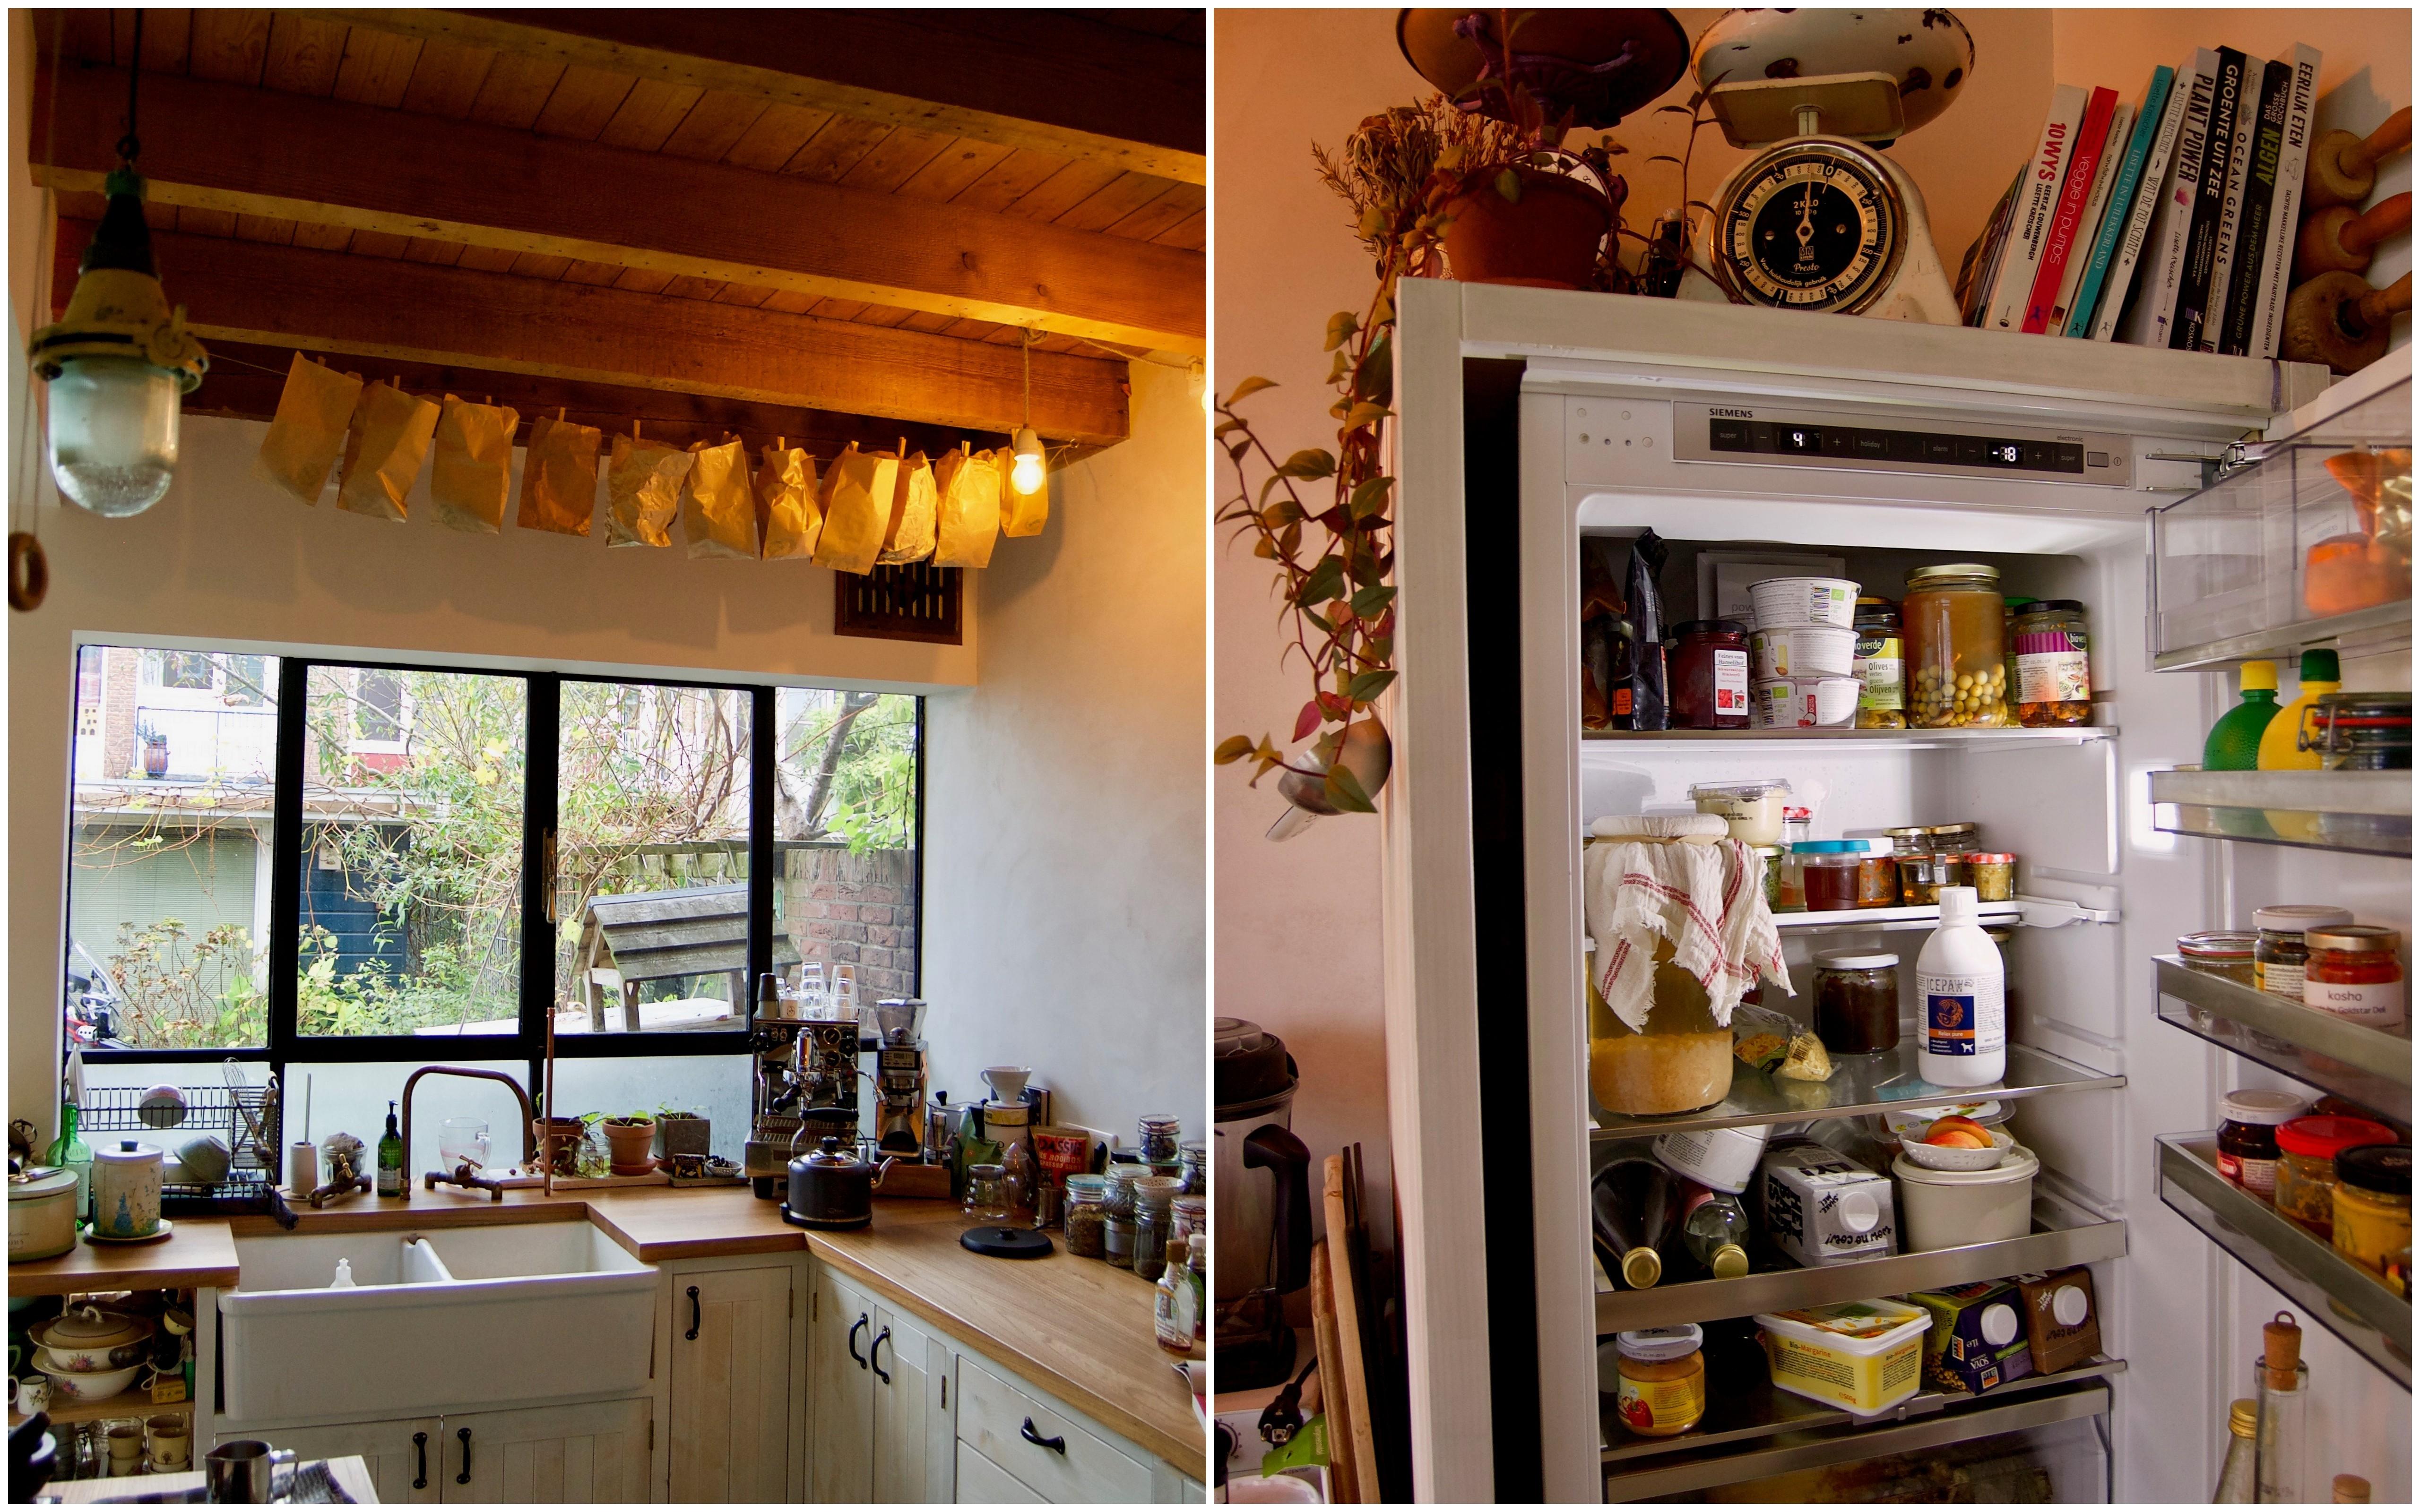 keuken en koelkast lisette kreischer